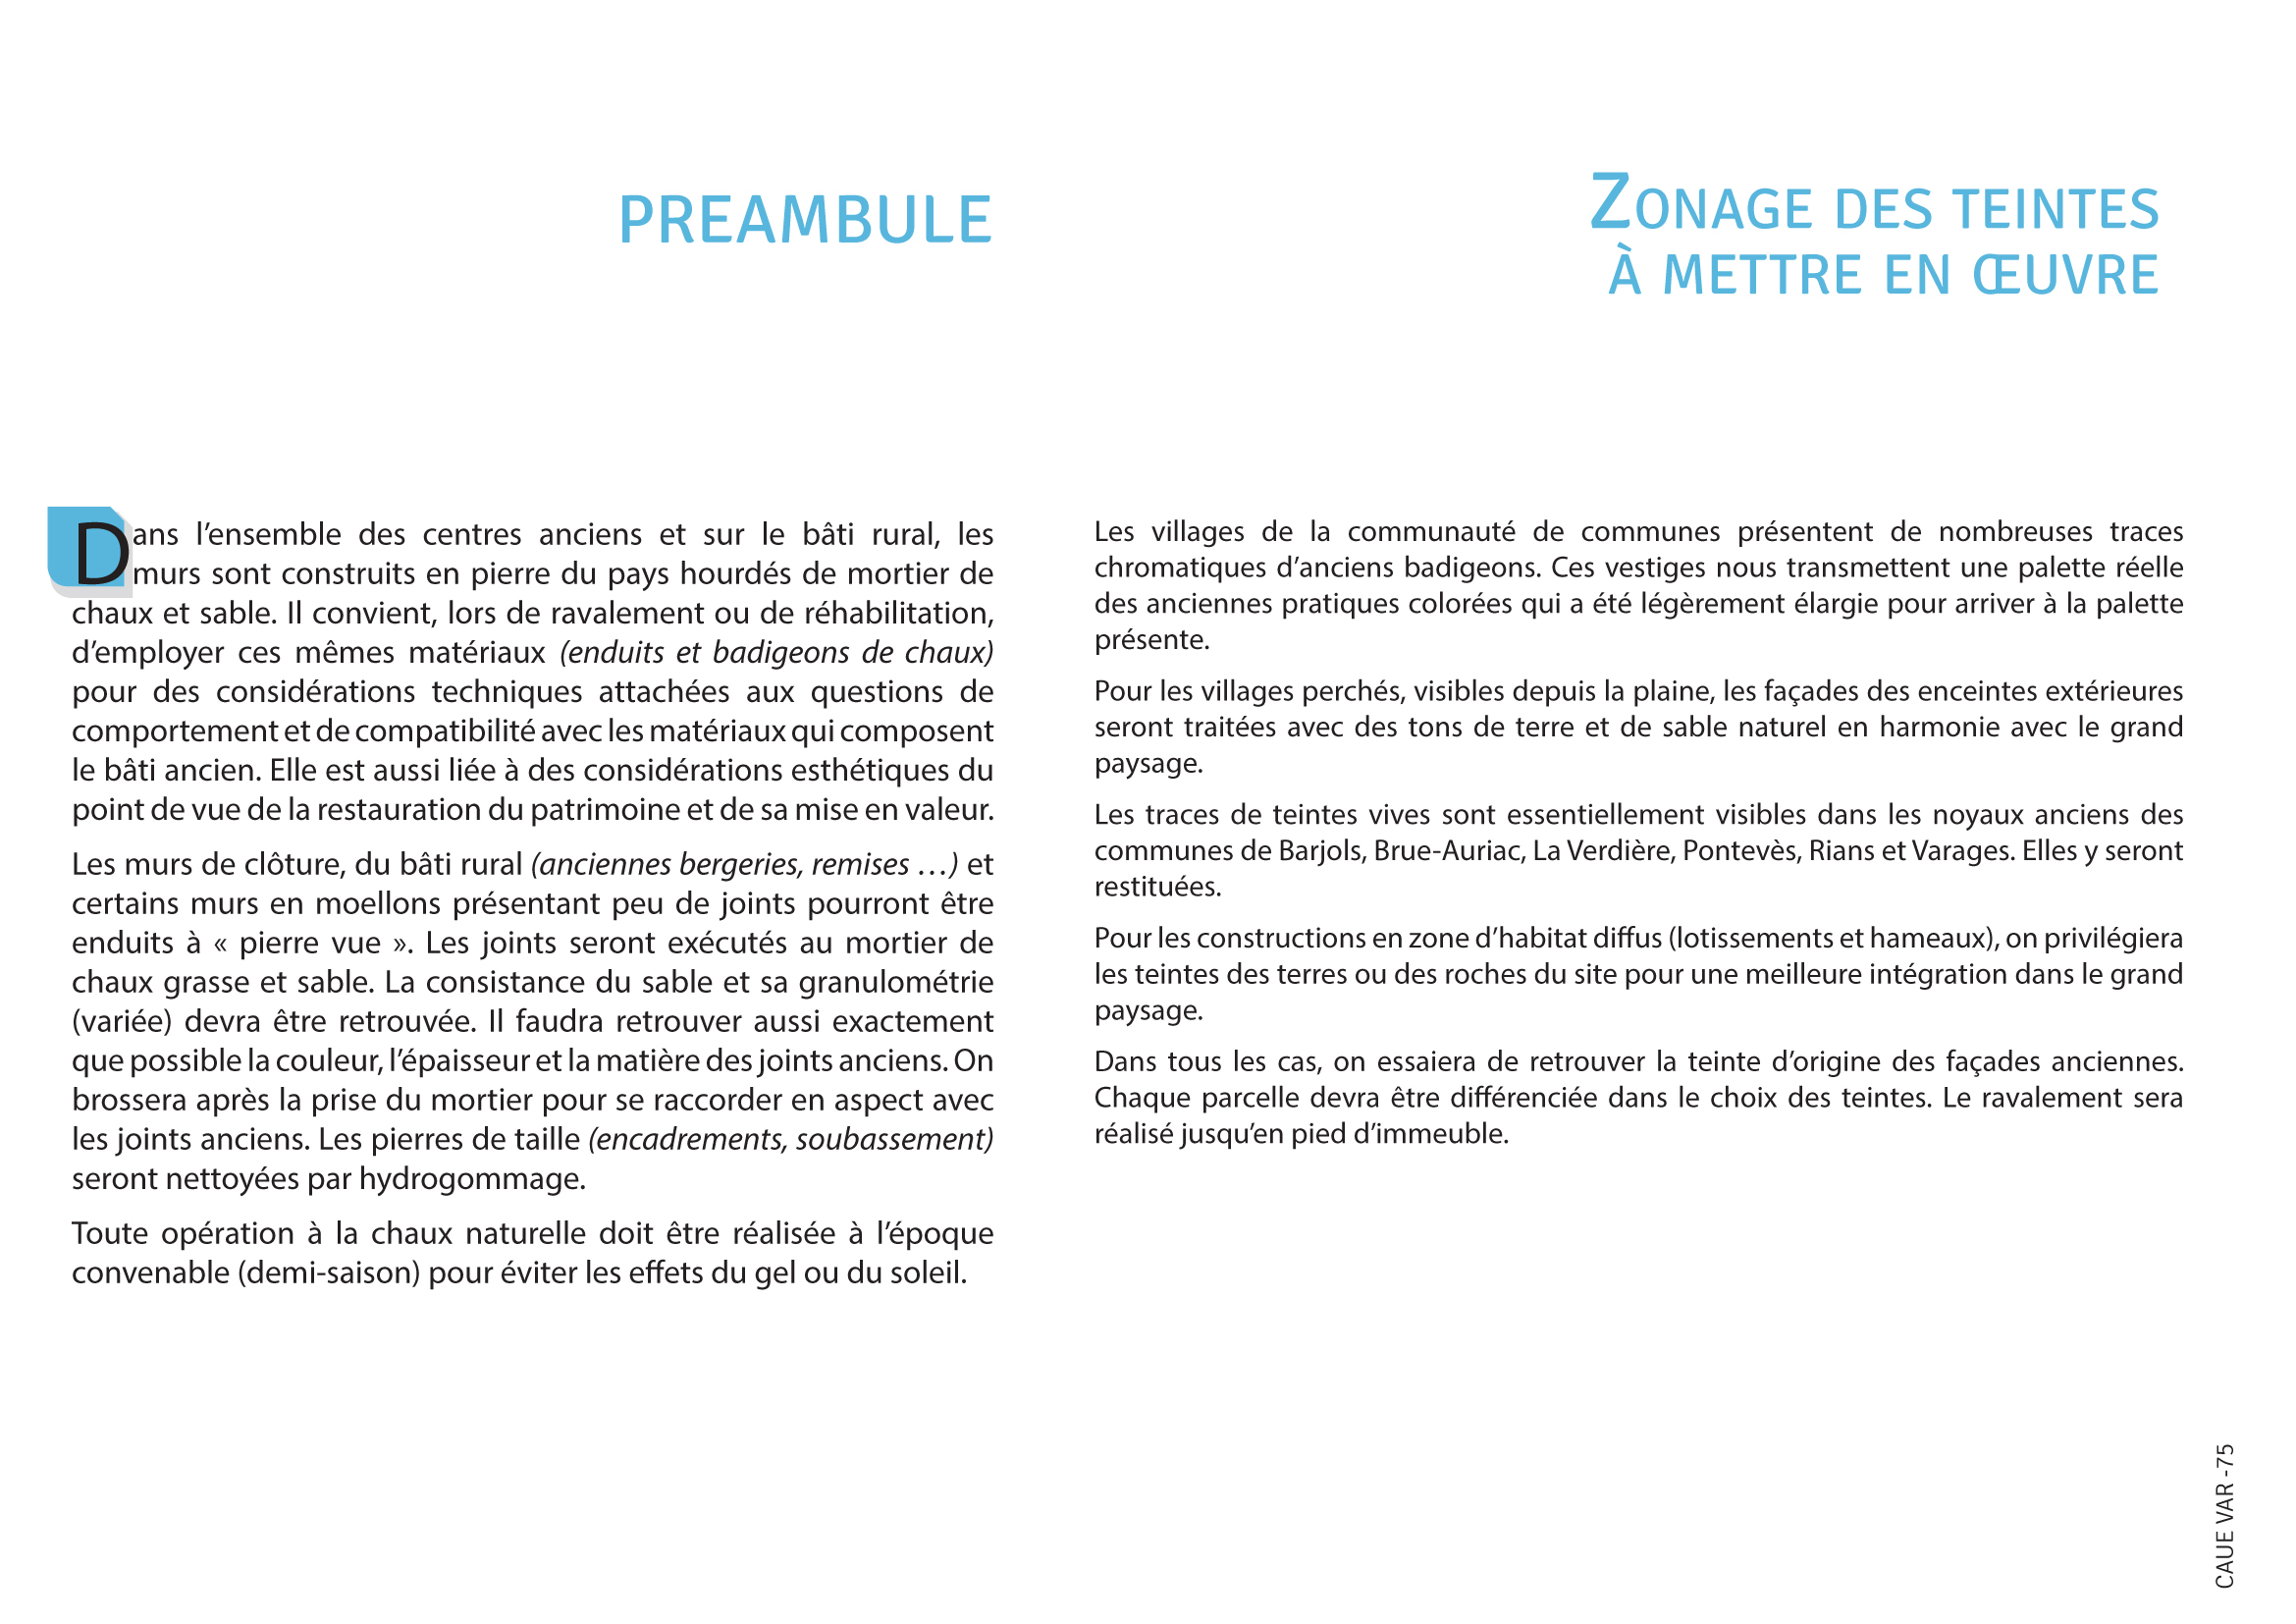 02_preambules_et_zonage_des_teintes_a_mettre_en_oeuvre-jpg